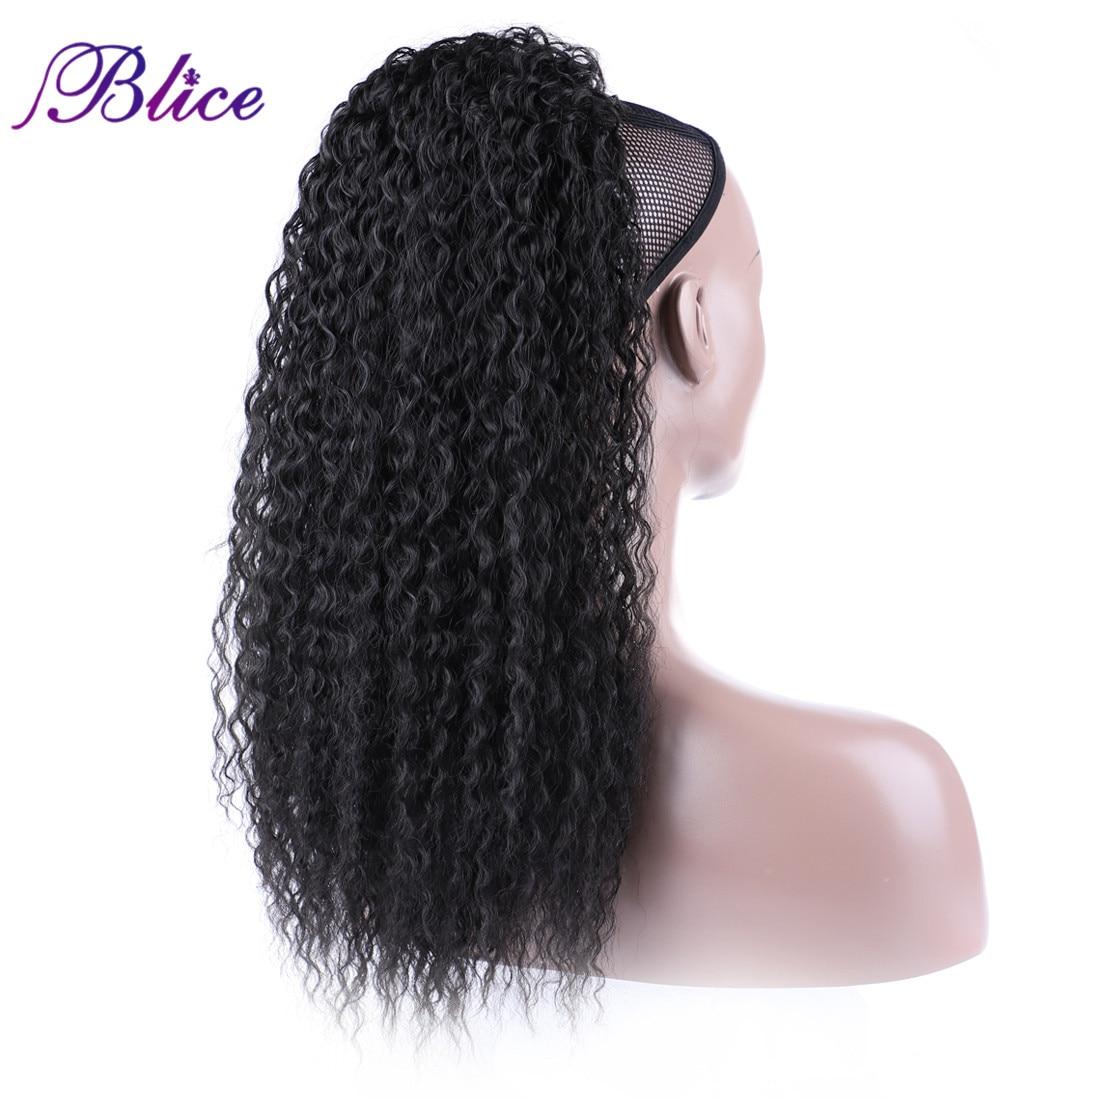 Blice Afro Kinky Curly Cabelo Sintético Rabo de Cavalo 18